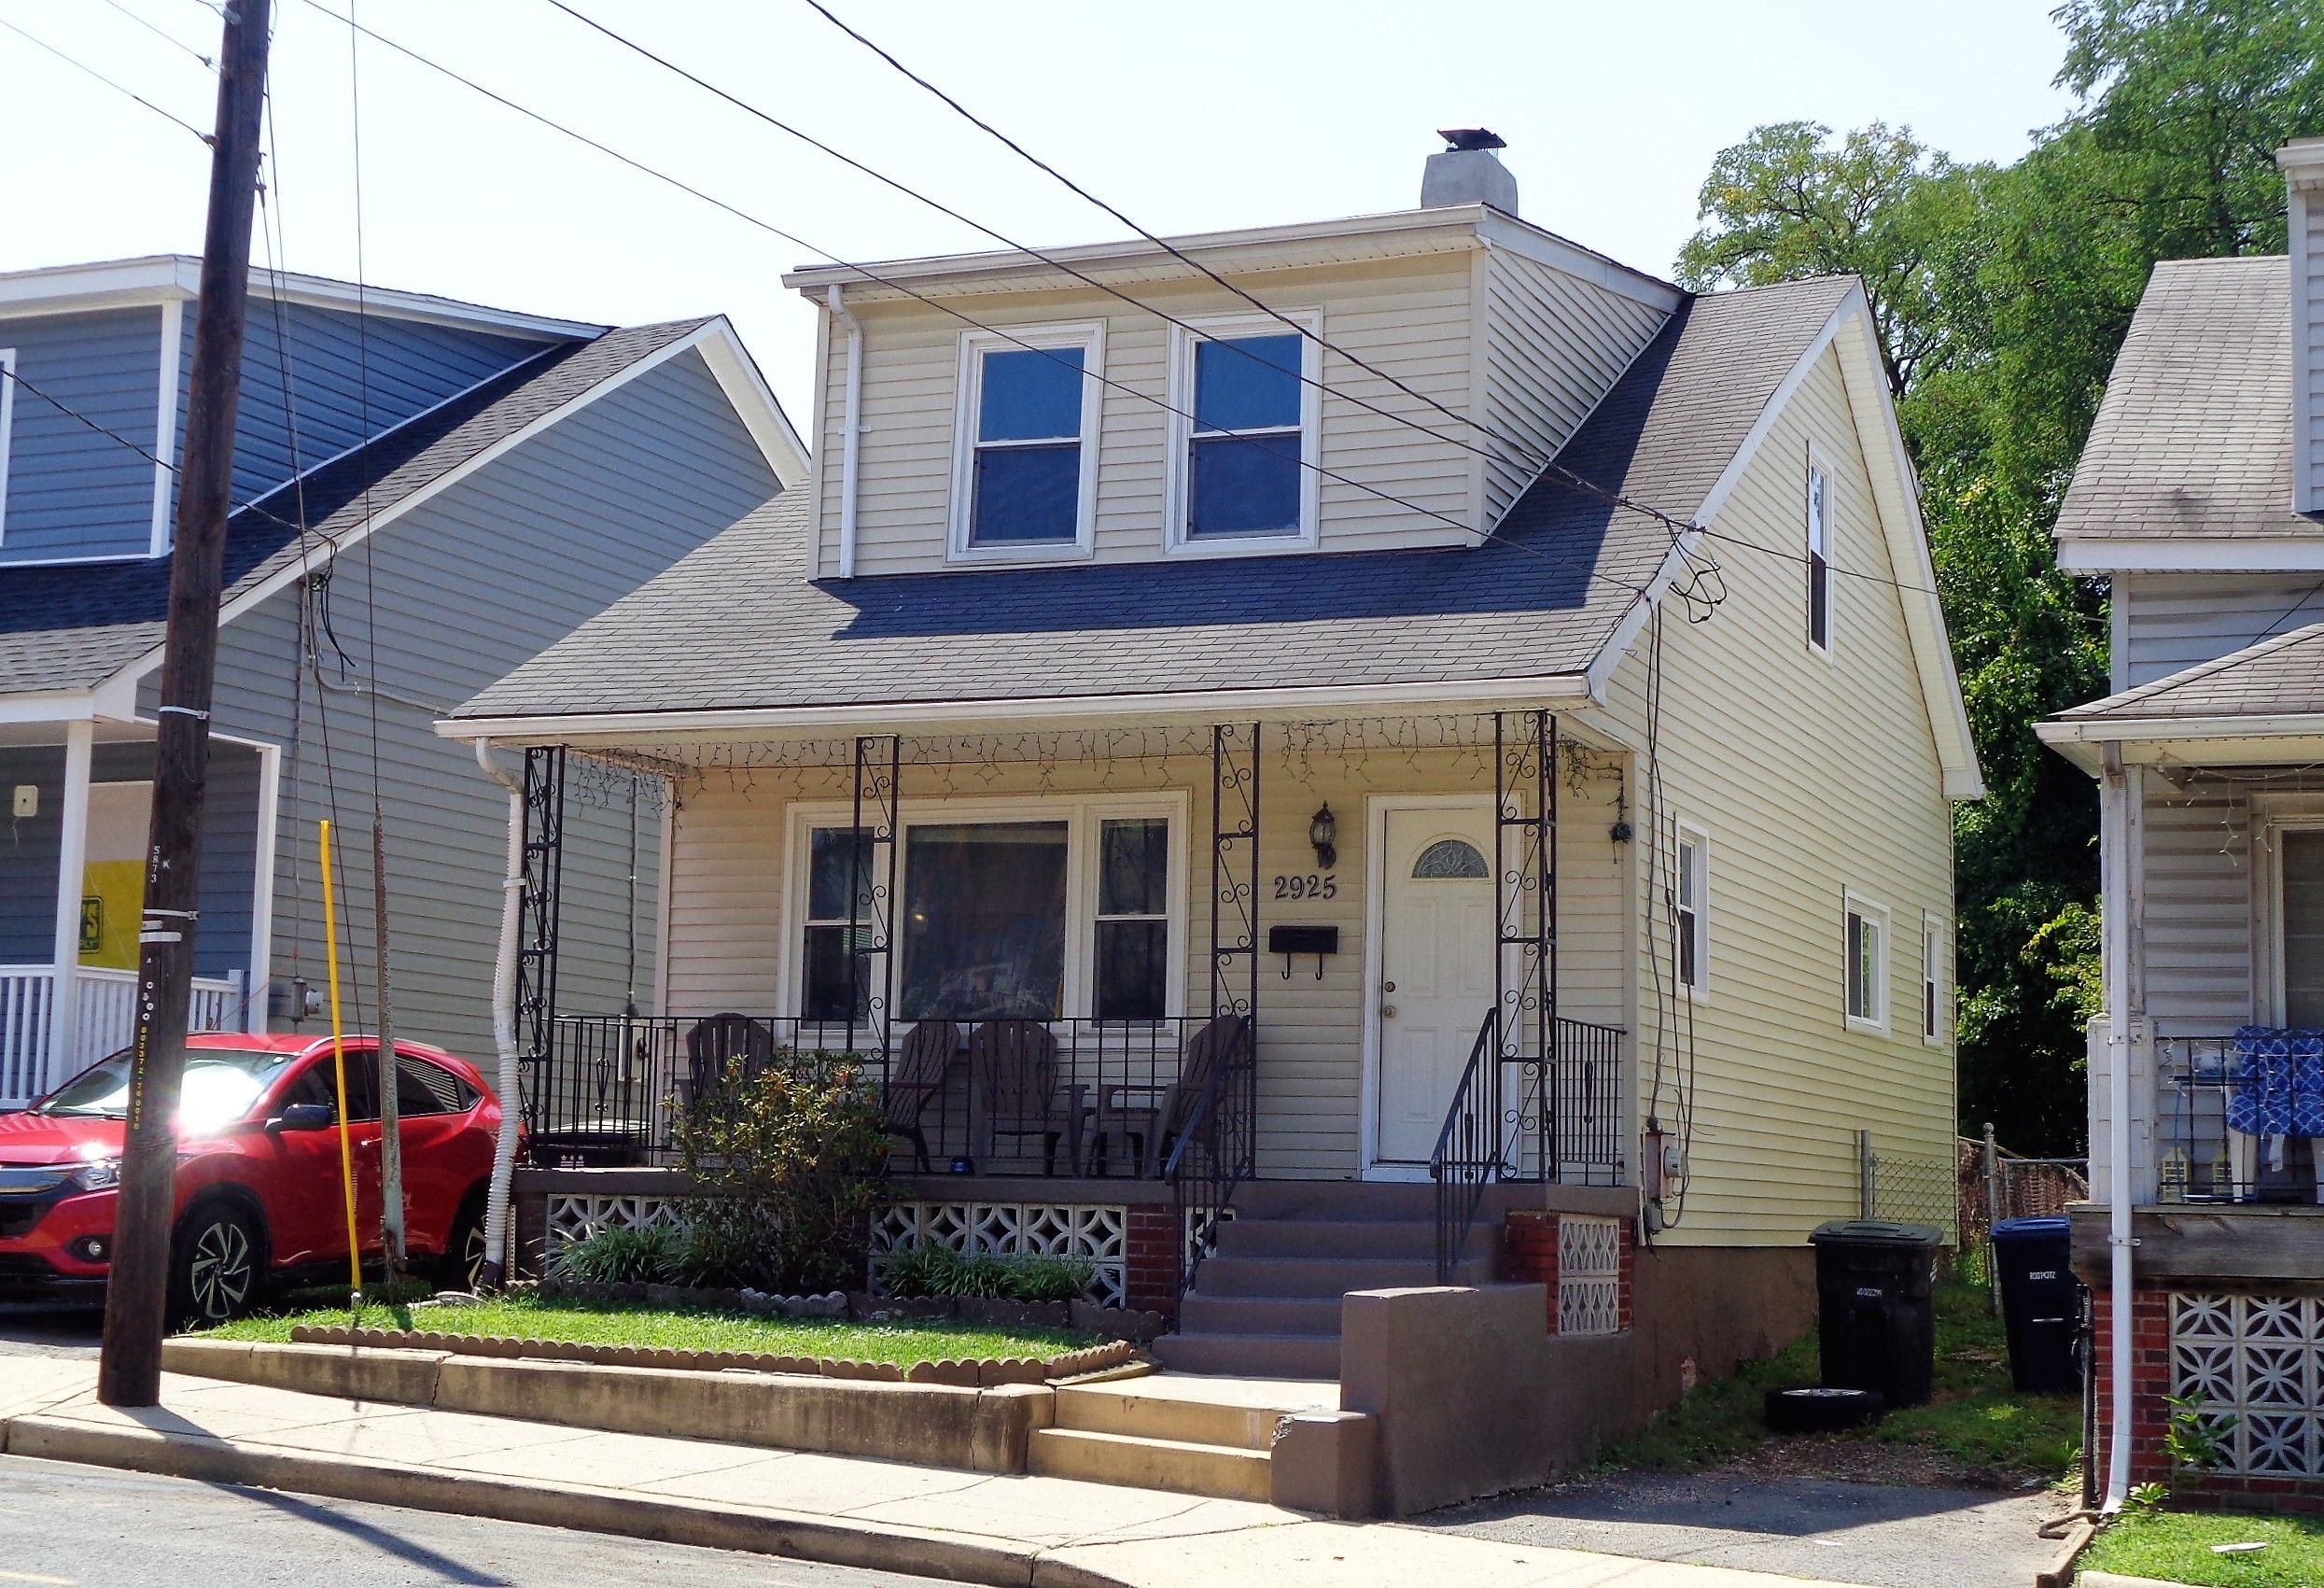 2925 Stanton Rd SE, Washington, DC